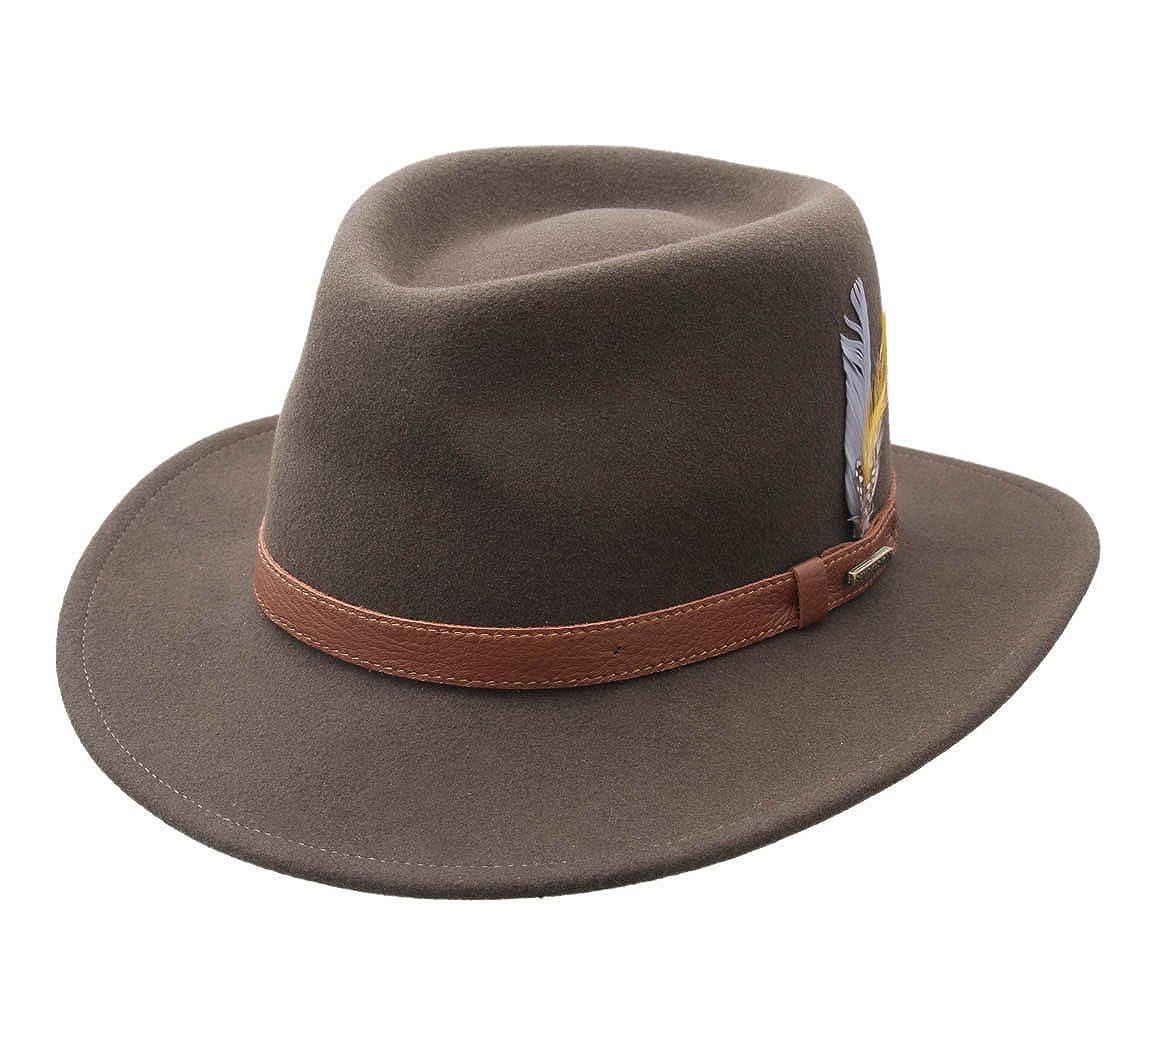 e7a2c9039d9ed Stetson Fedora Hat wool felt men Atlanta Vitafelt - Size M: Amazon.co.uk:  Clothing